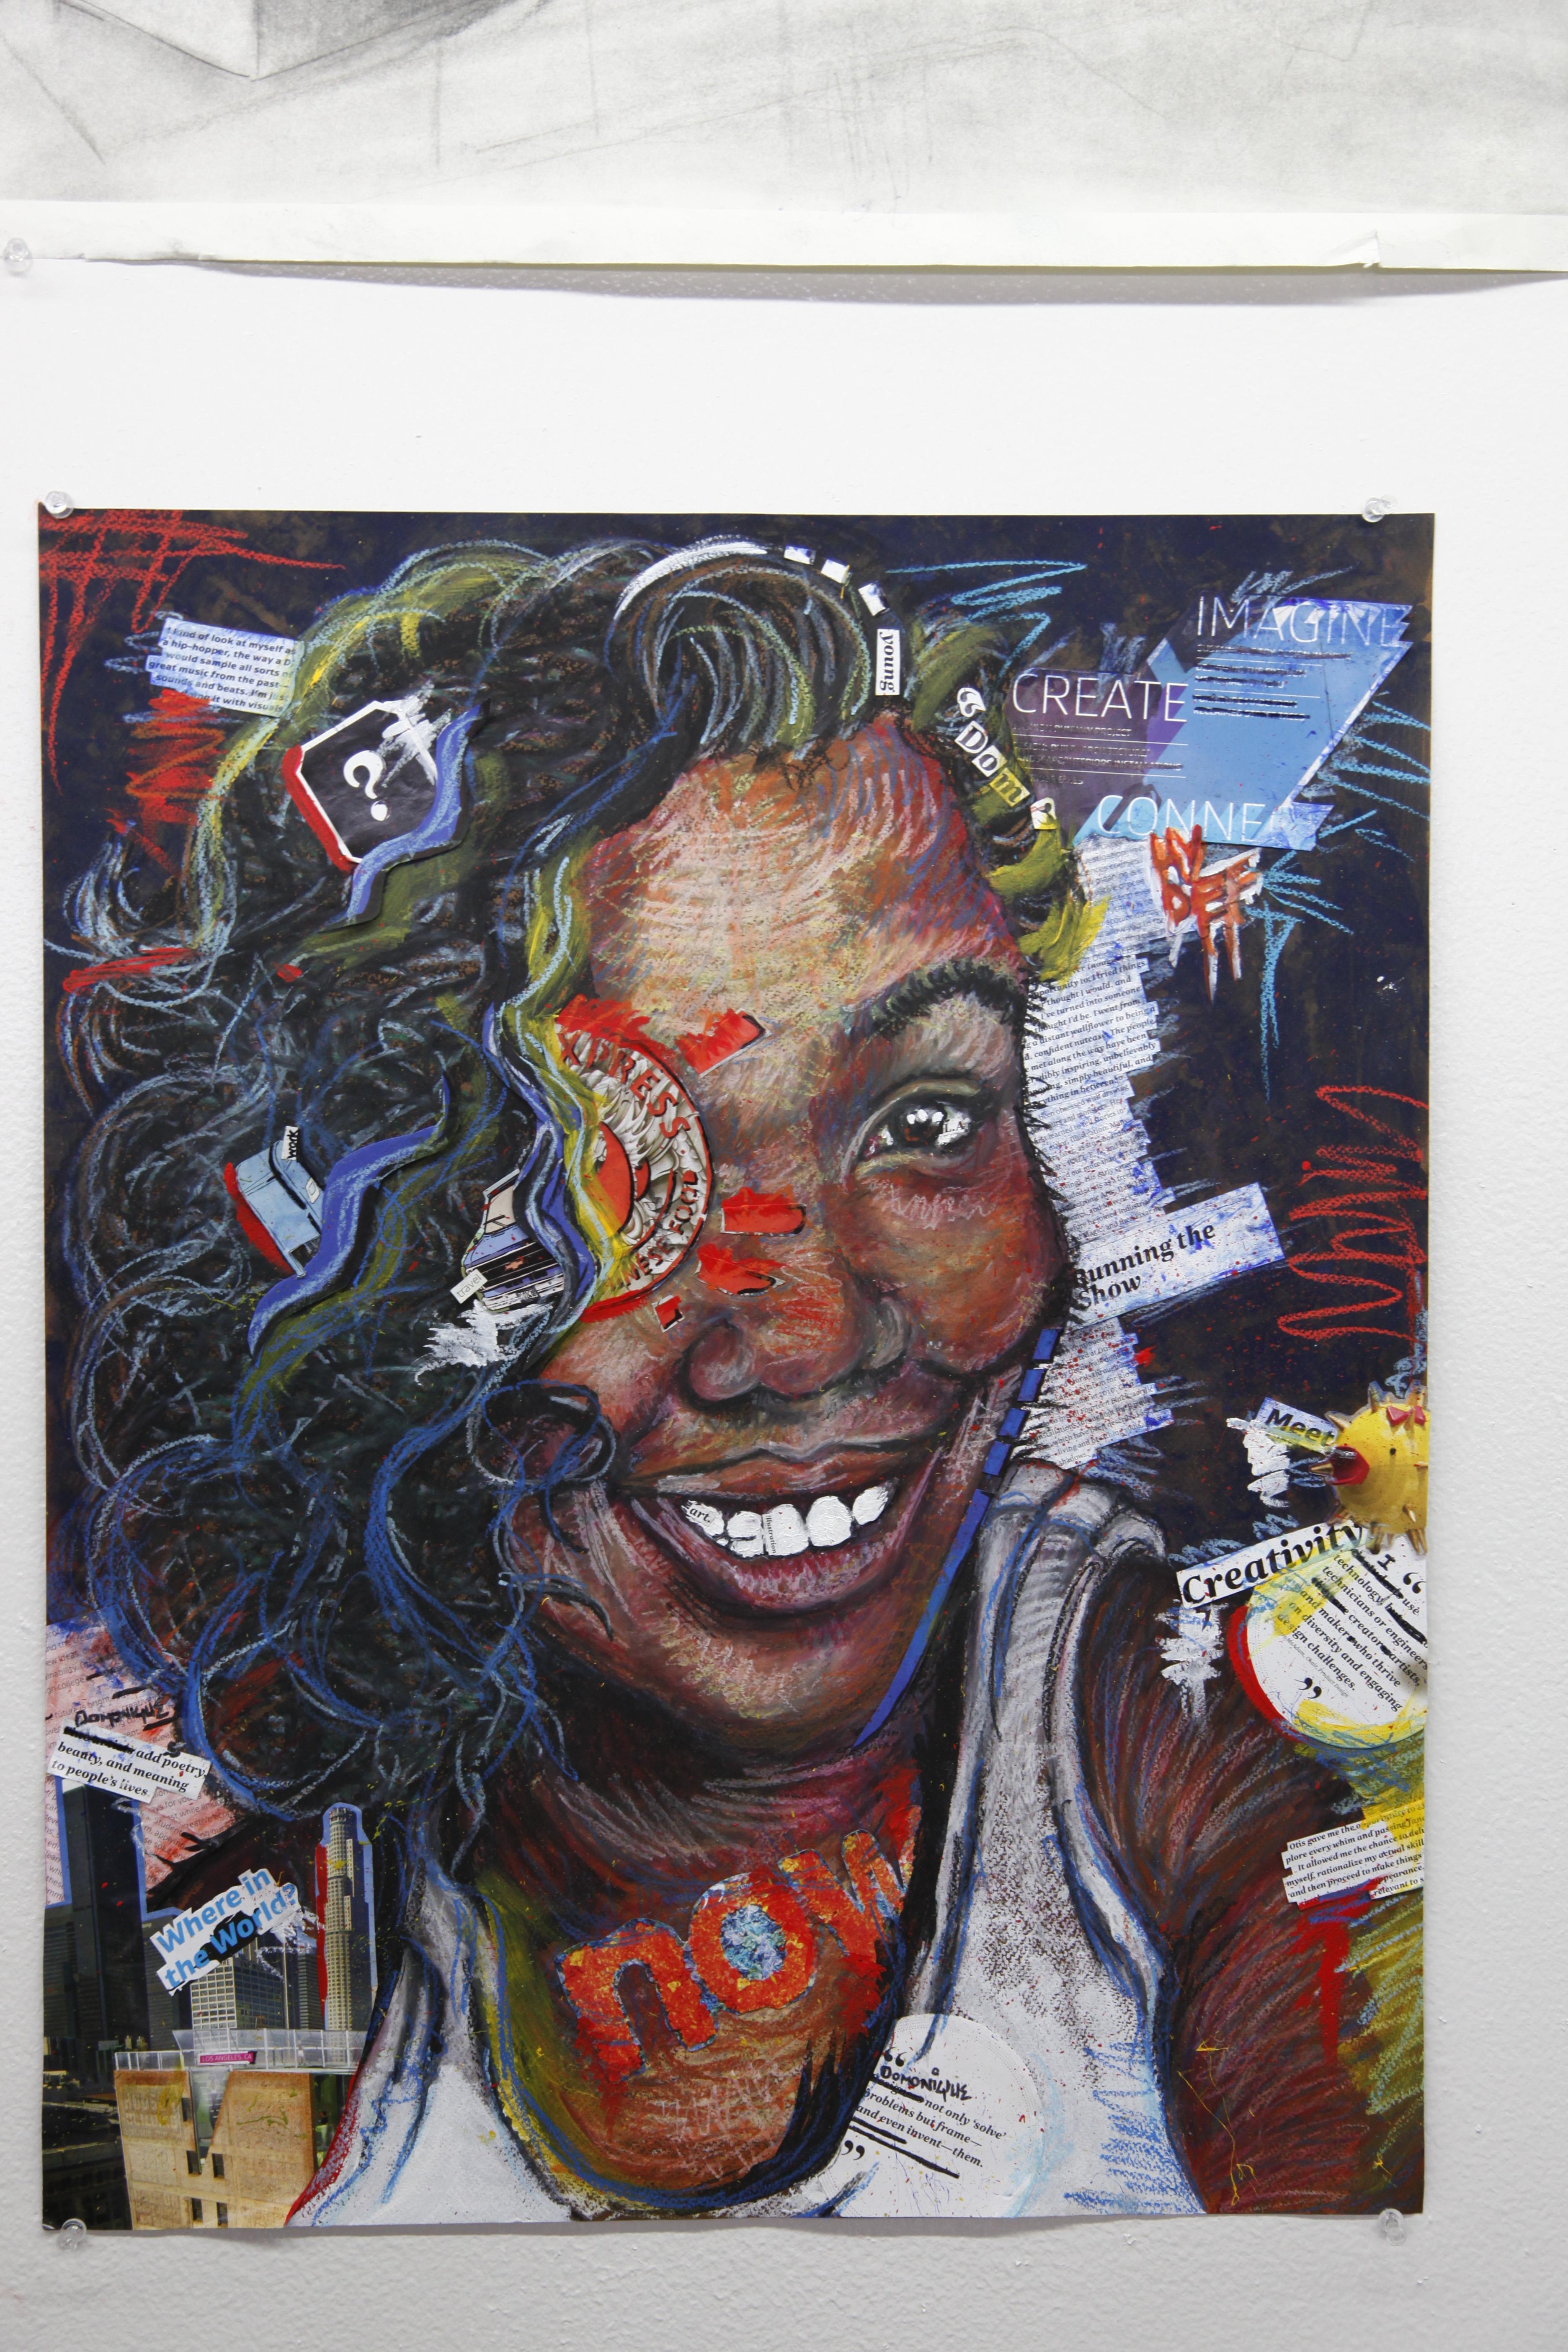 Summer Program - Arts   Otis College of Art and Design: Summer of Art, College Preparation Program